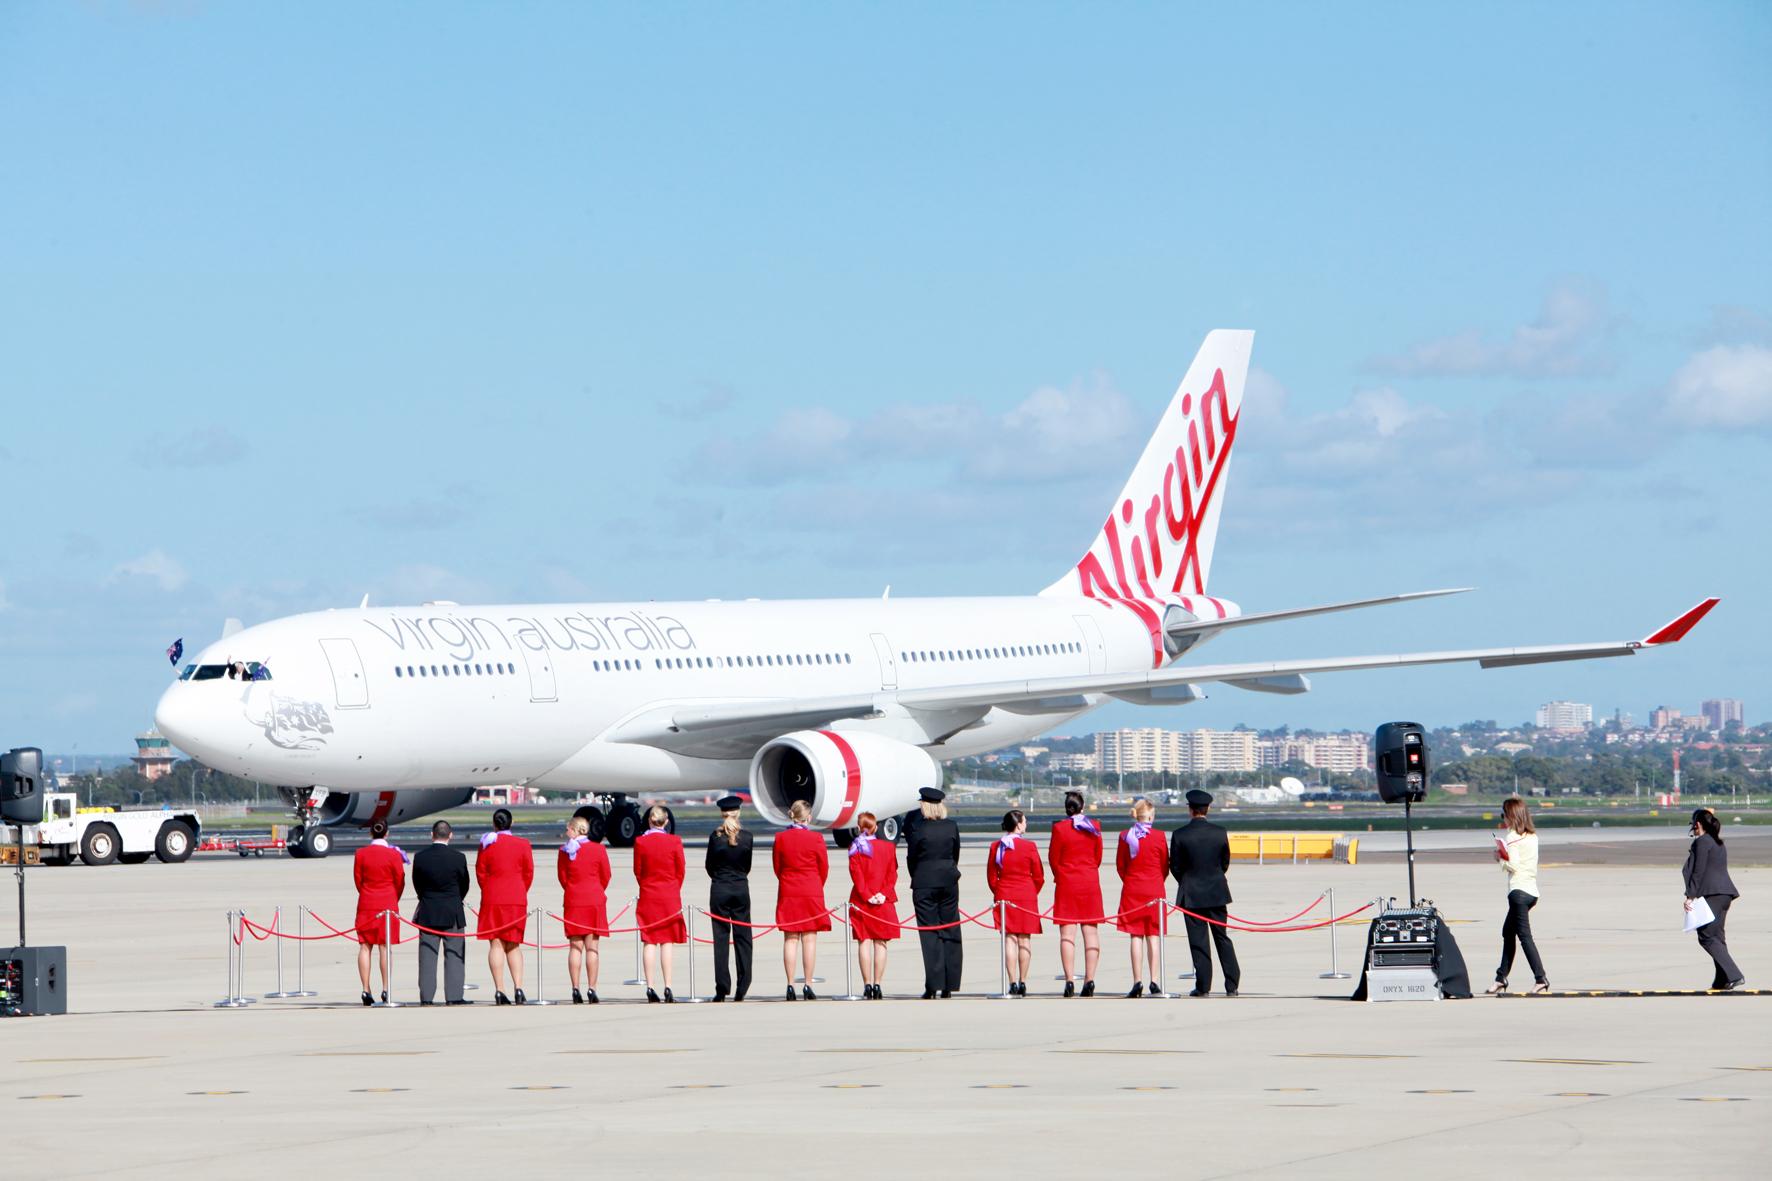 Podium Business Events for Virgin Australia